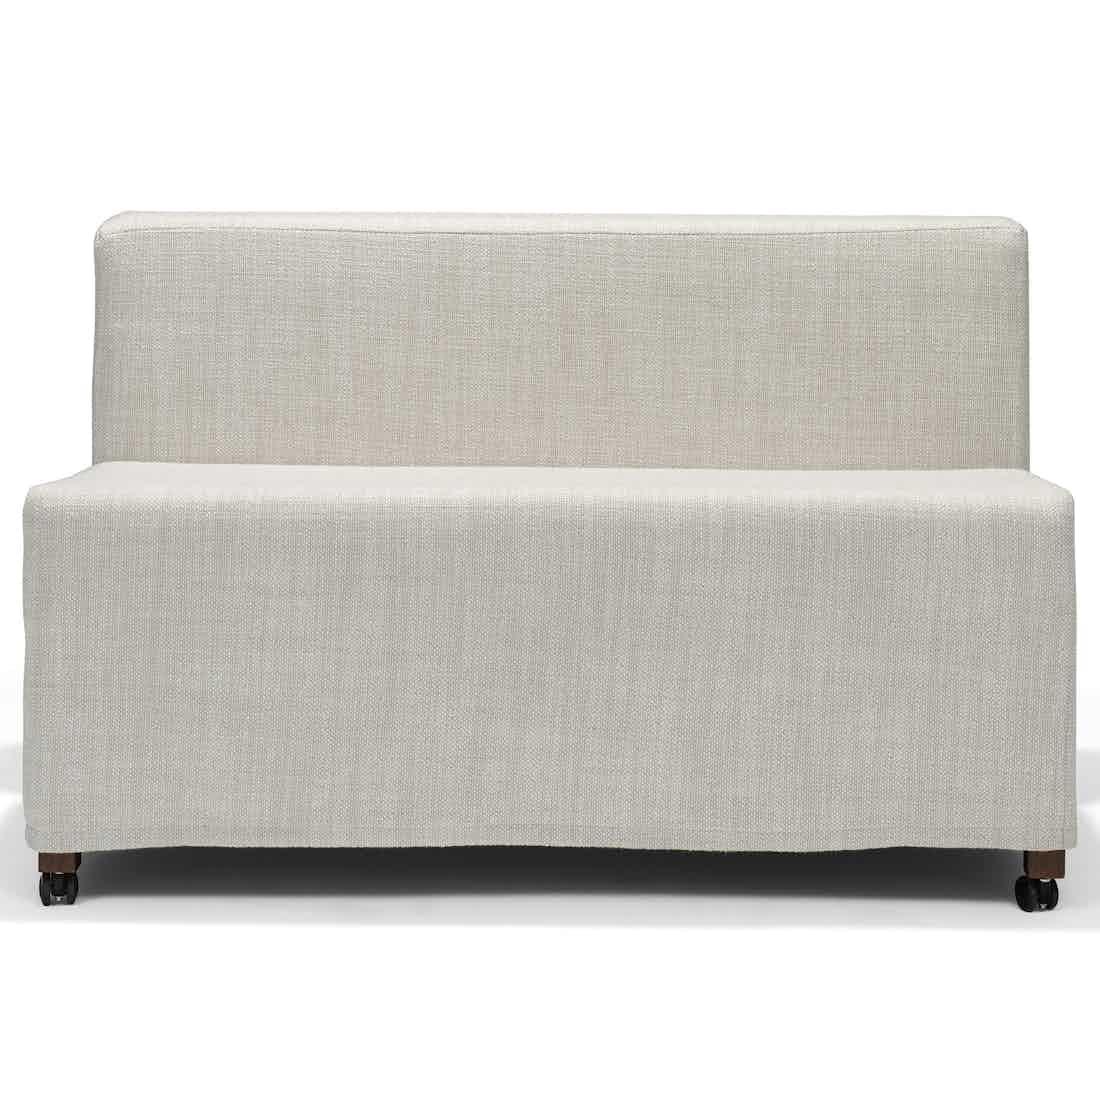 Linteloo-long-dwi-chair-haute-living